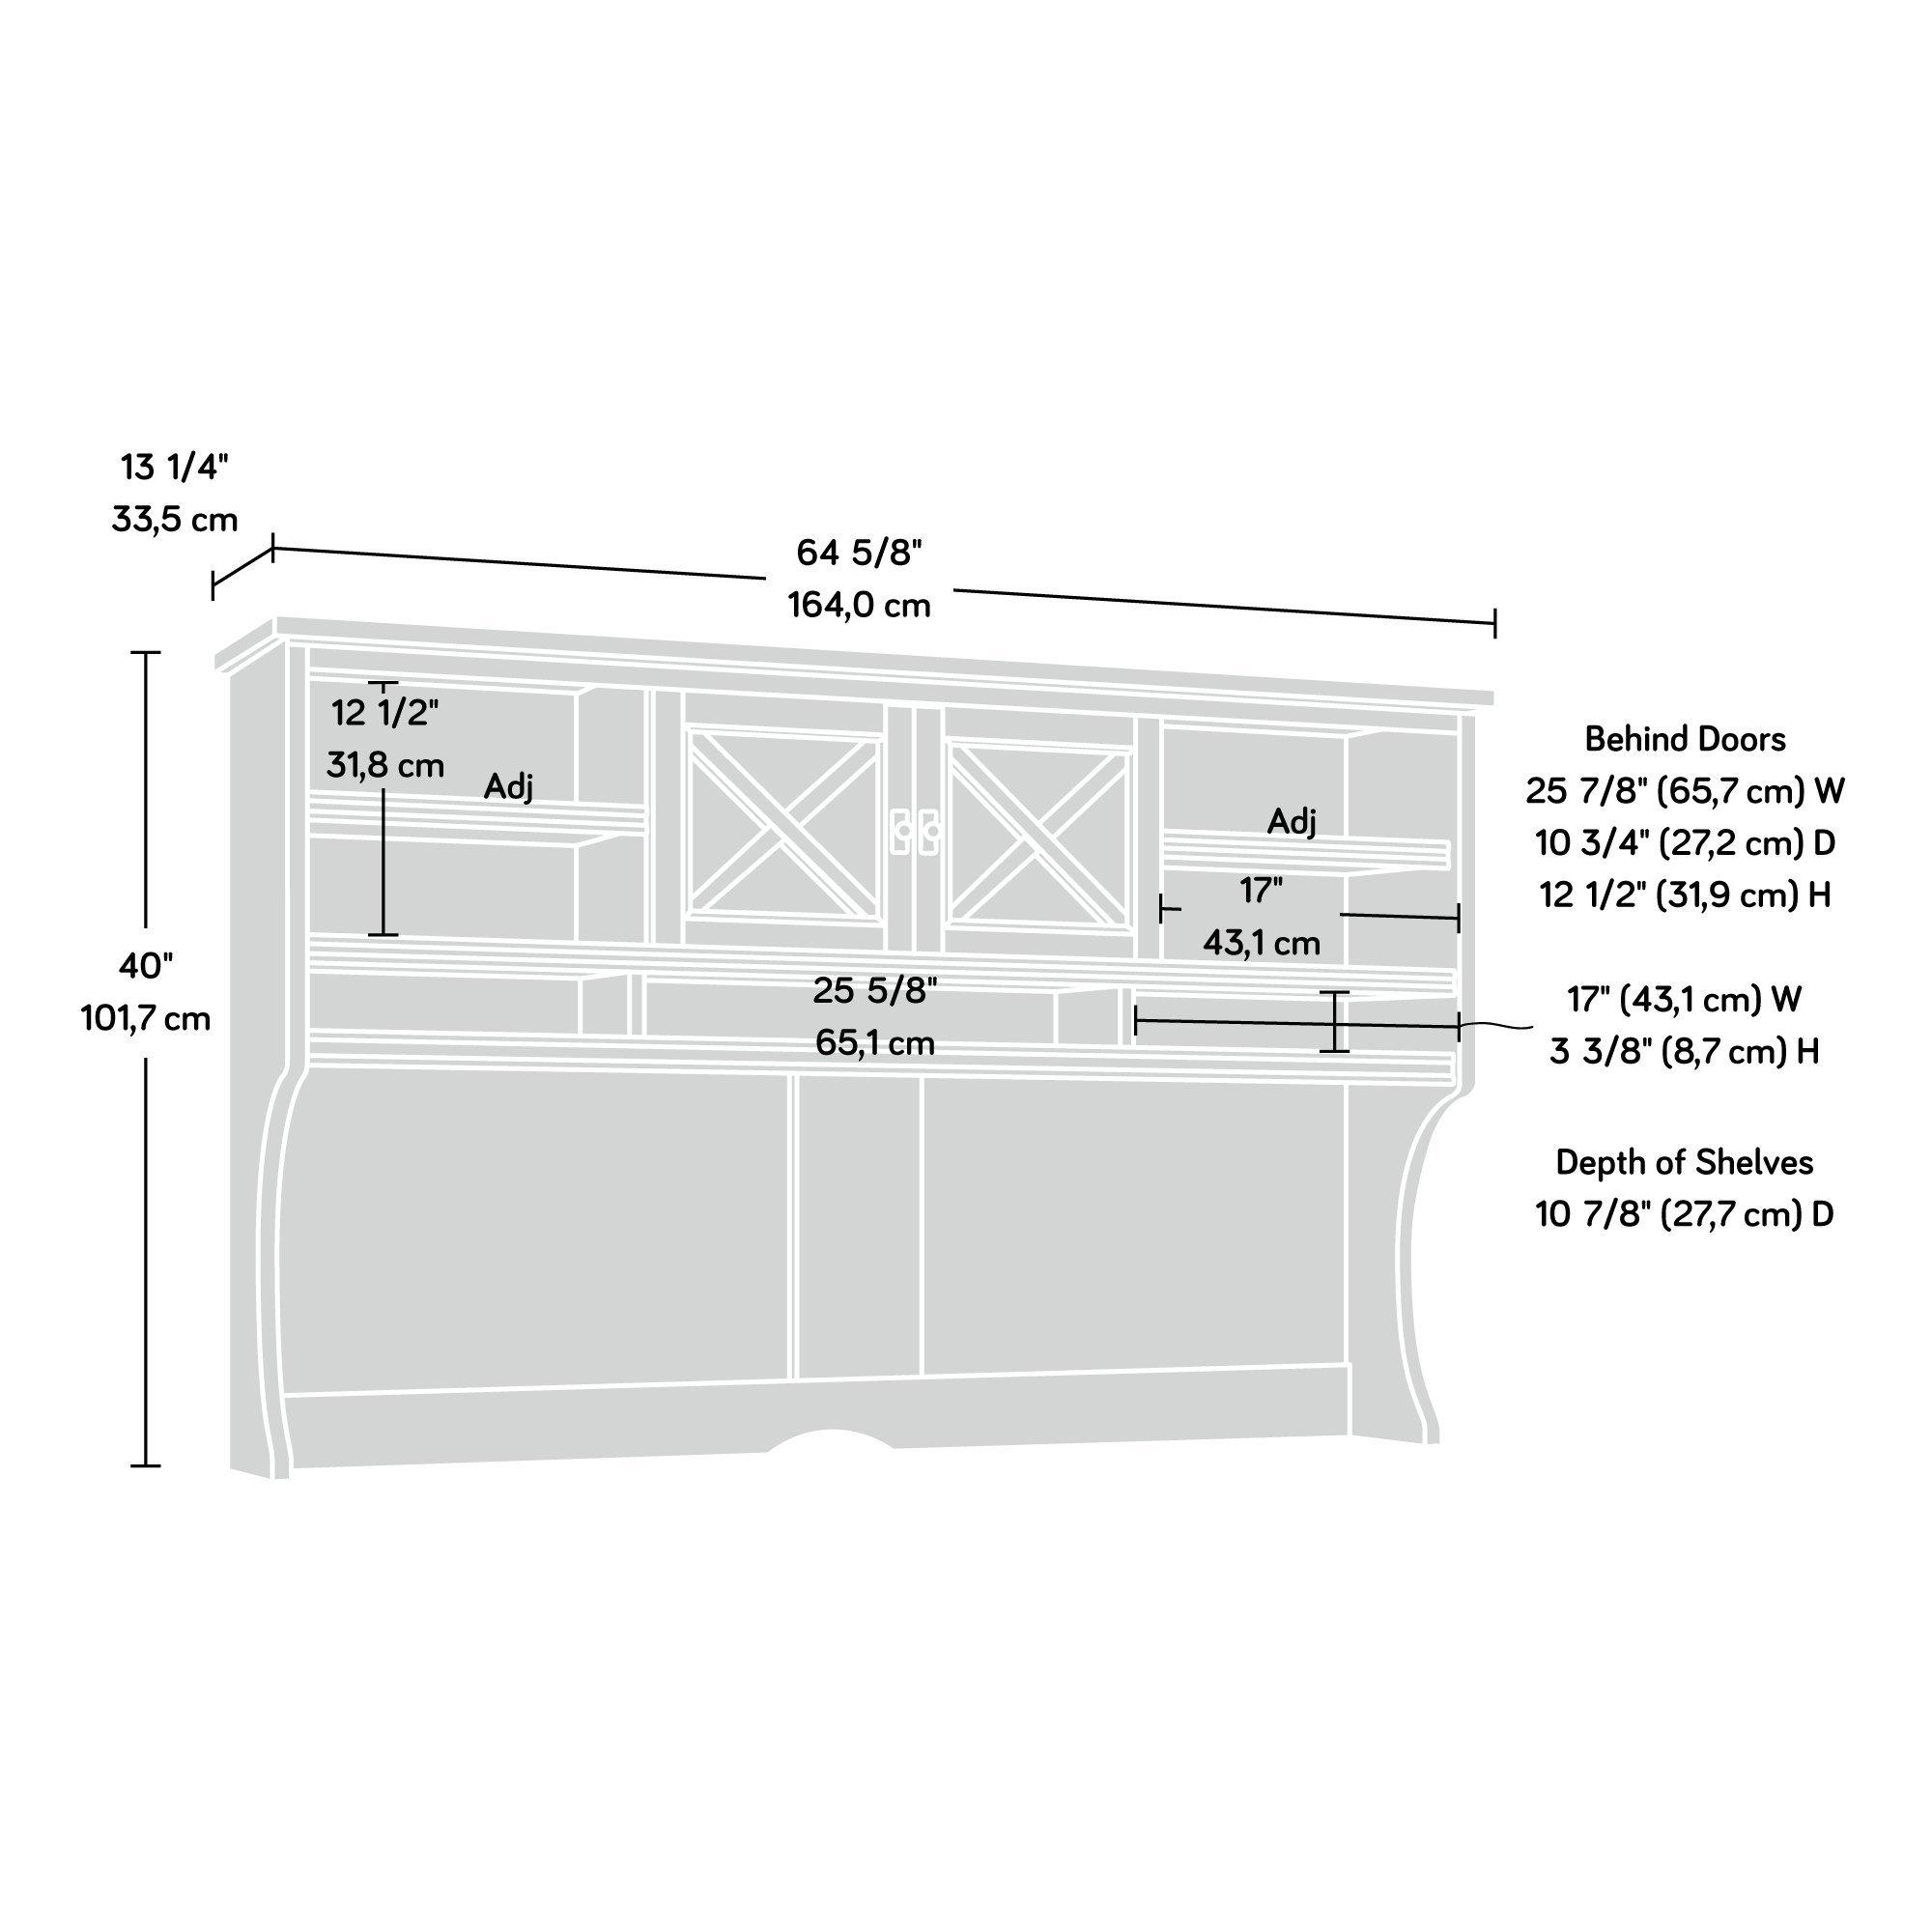 Sauder 422983 Costa Large Hutch, L: 64.57'' x W: 13.19'' x H: 40.04'', Coffee Oak Finish by Sauder (Image #9)